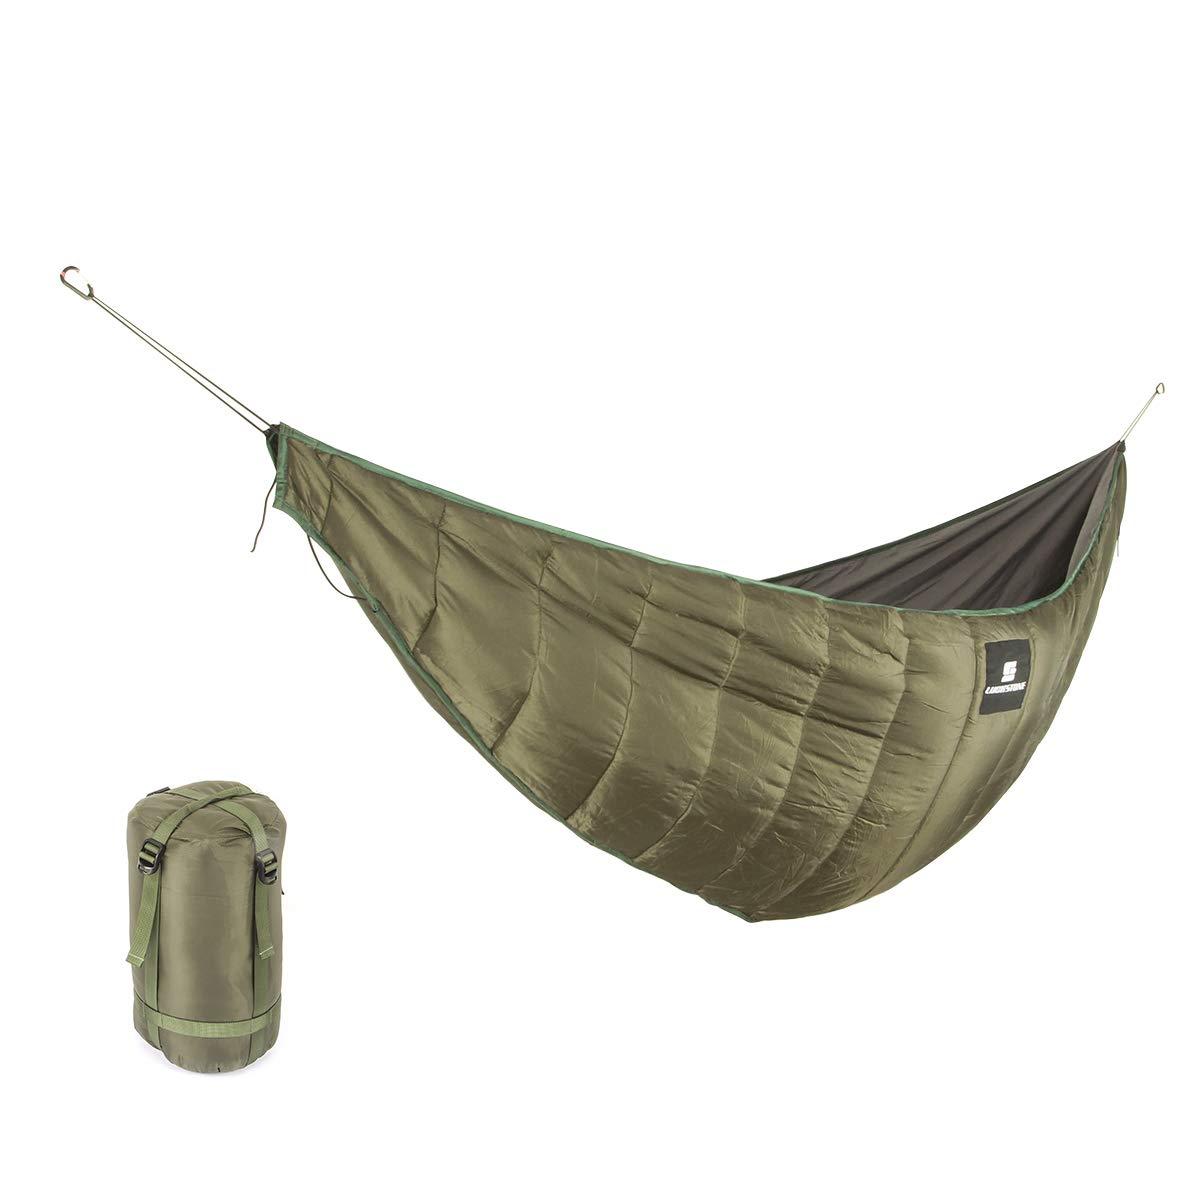 Sports & Entertainment Outdoor Winter Warm Sleeping Bag Hammock Underquilt Sleeping Bag Warmer Under Quilt Blanket For Outdoor Camping Hiking